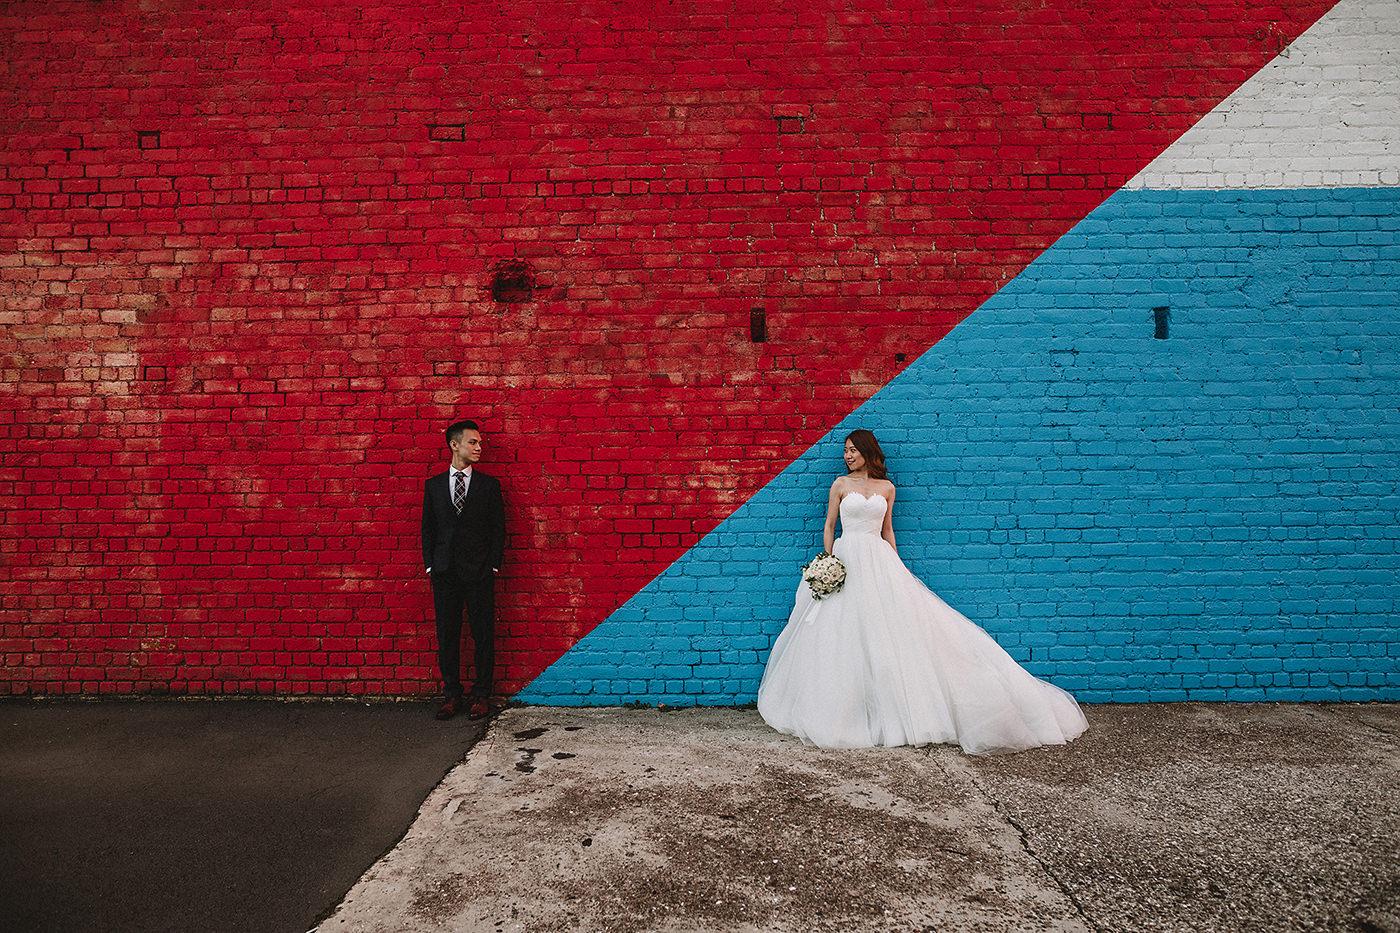 wedding_photographer_nz-00011.jpg